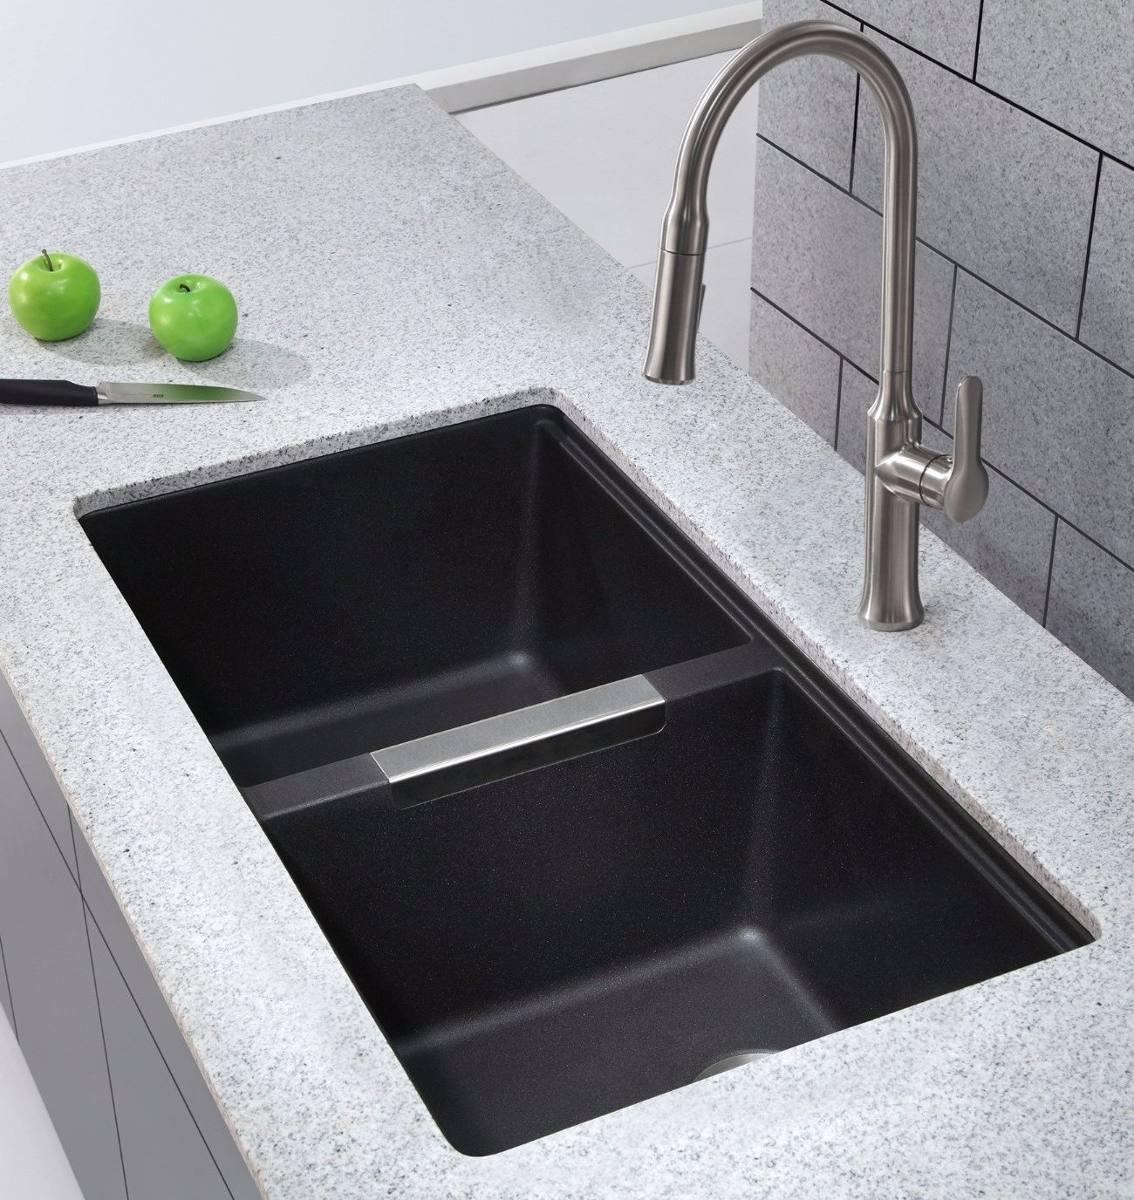 fregadero negro doble tina tarja cocina moderno de granito